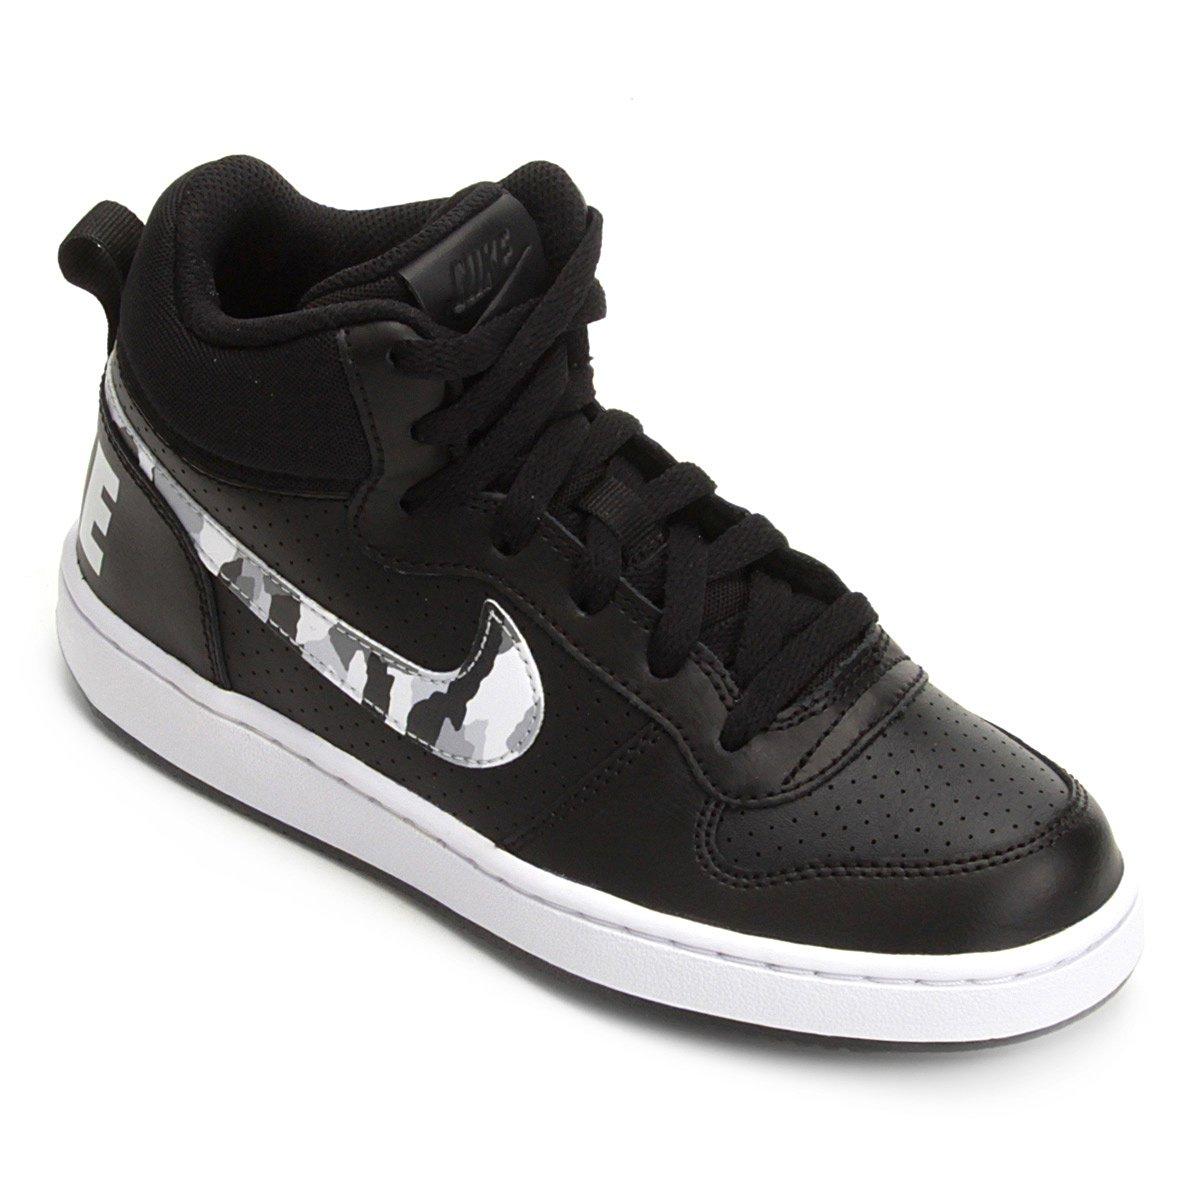 f4c27fc540d Tênis Infantil Nike Court Borough Mid Masculino - Preto e Branco - Compre  Agora